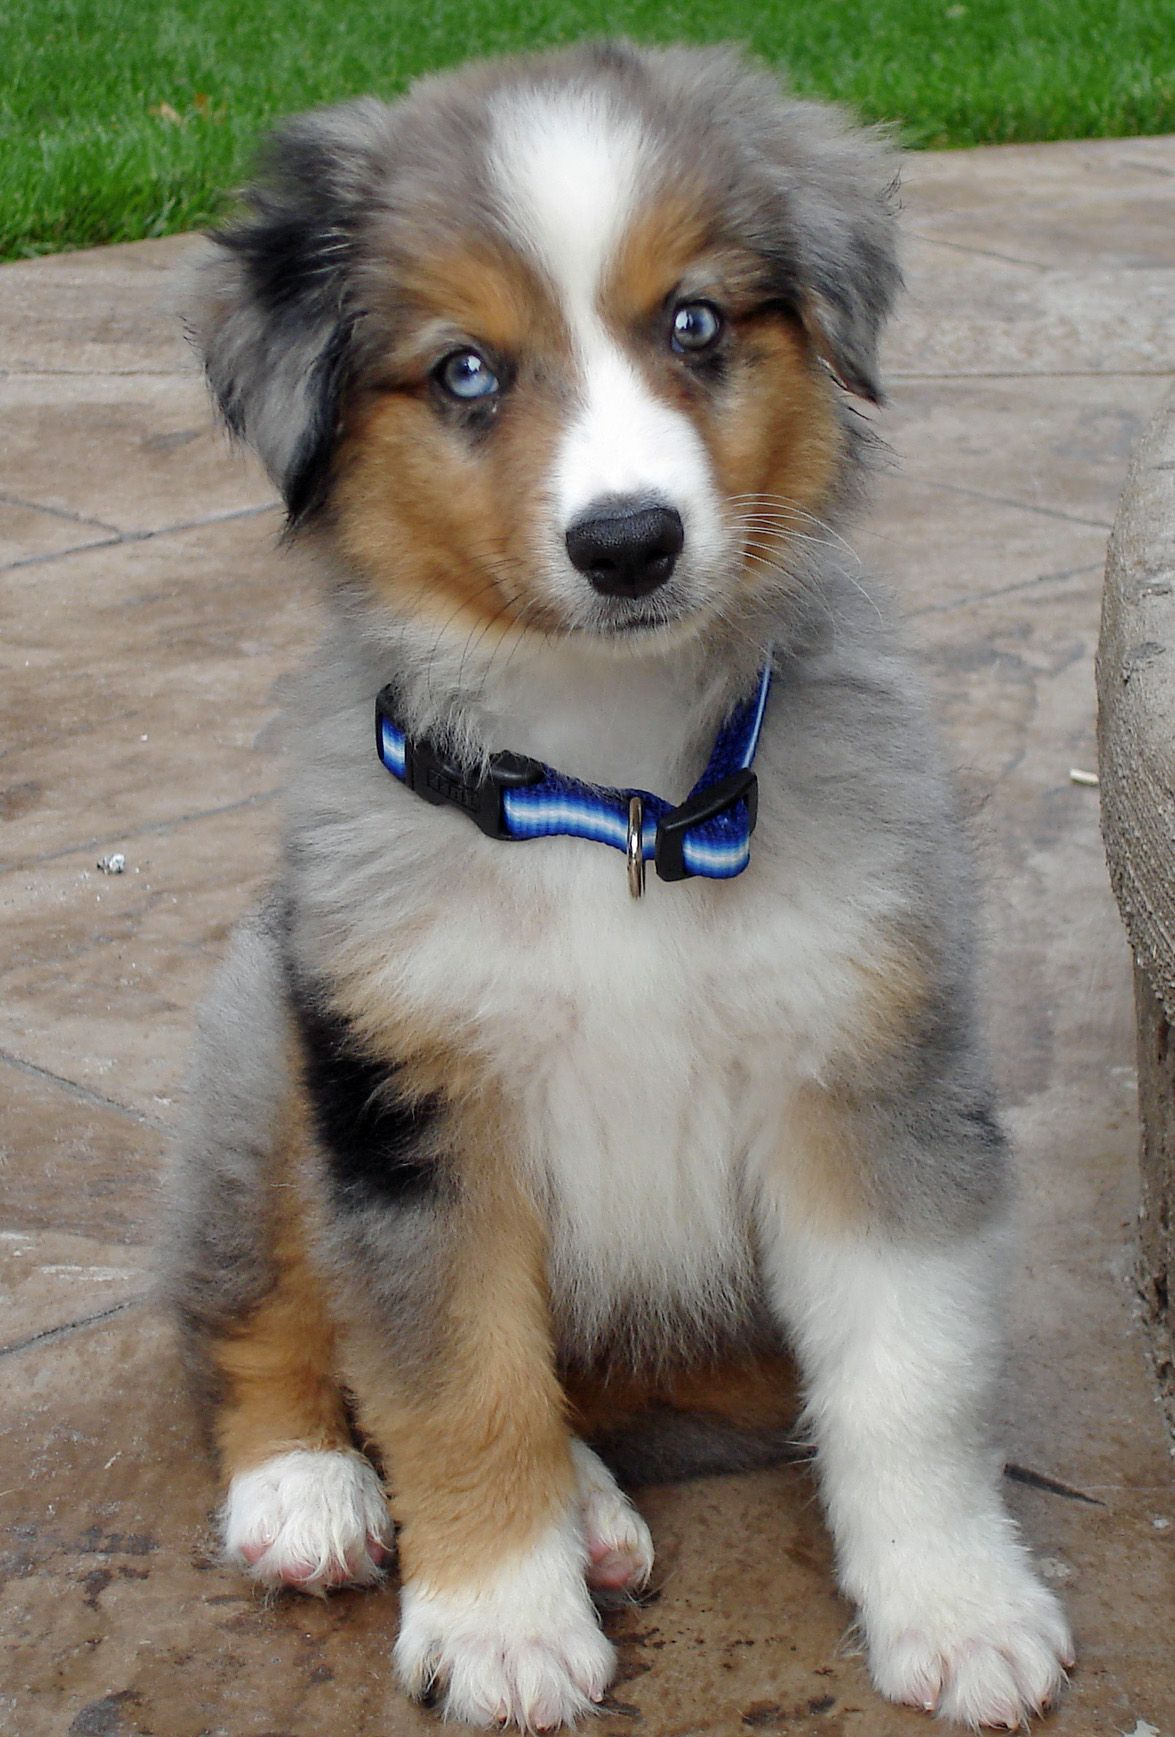 I Want One So Bad Miniature Australian Shepherd Australian Shepherd Puppies Puppies